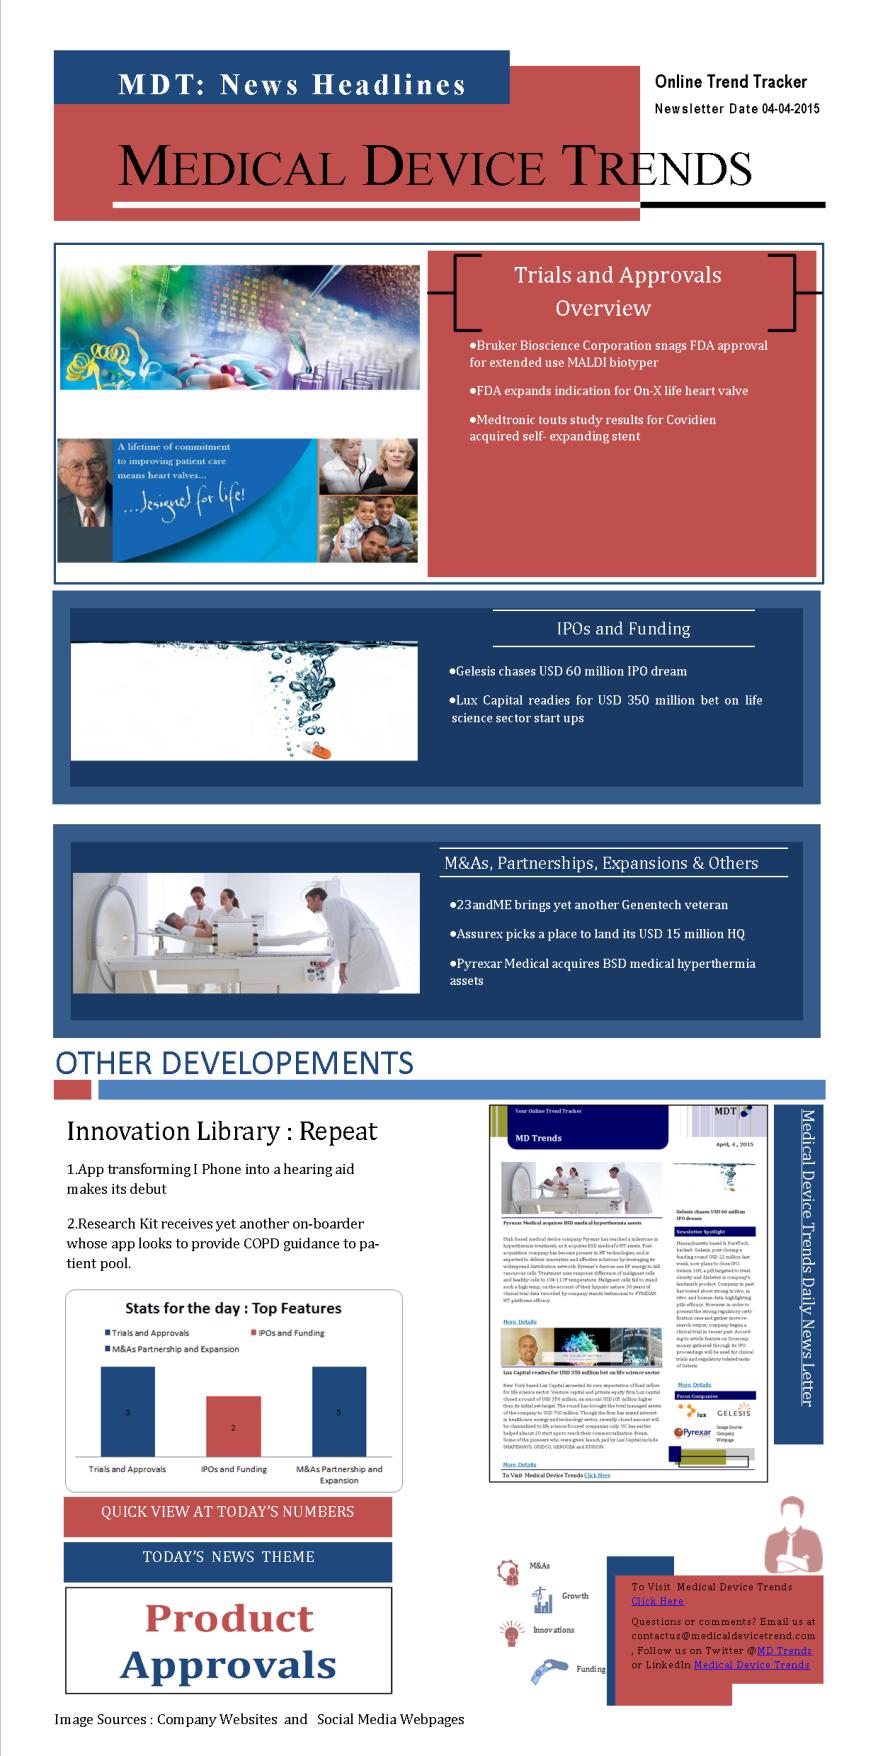 MDT News Releases 4